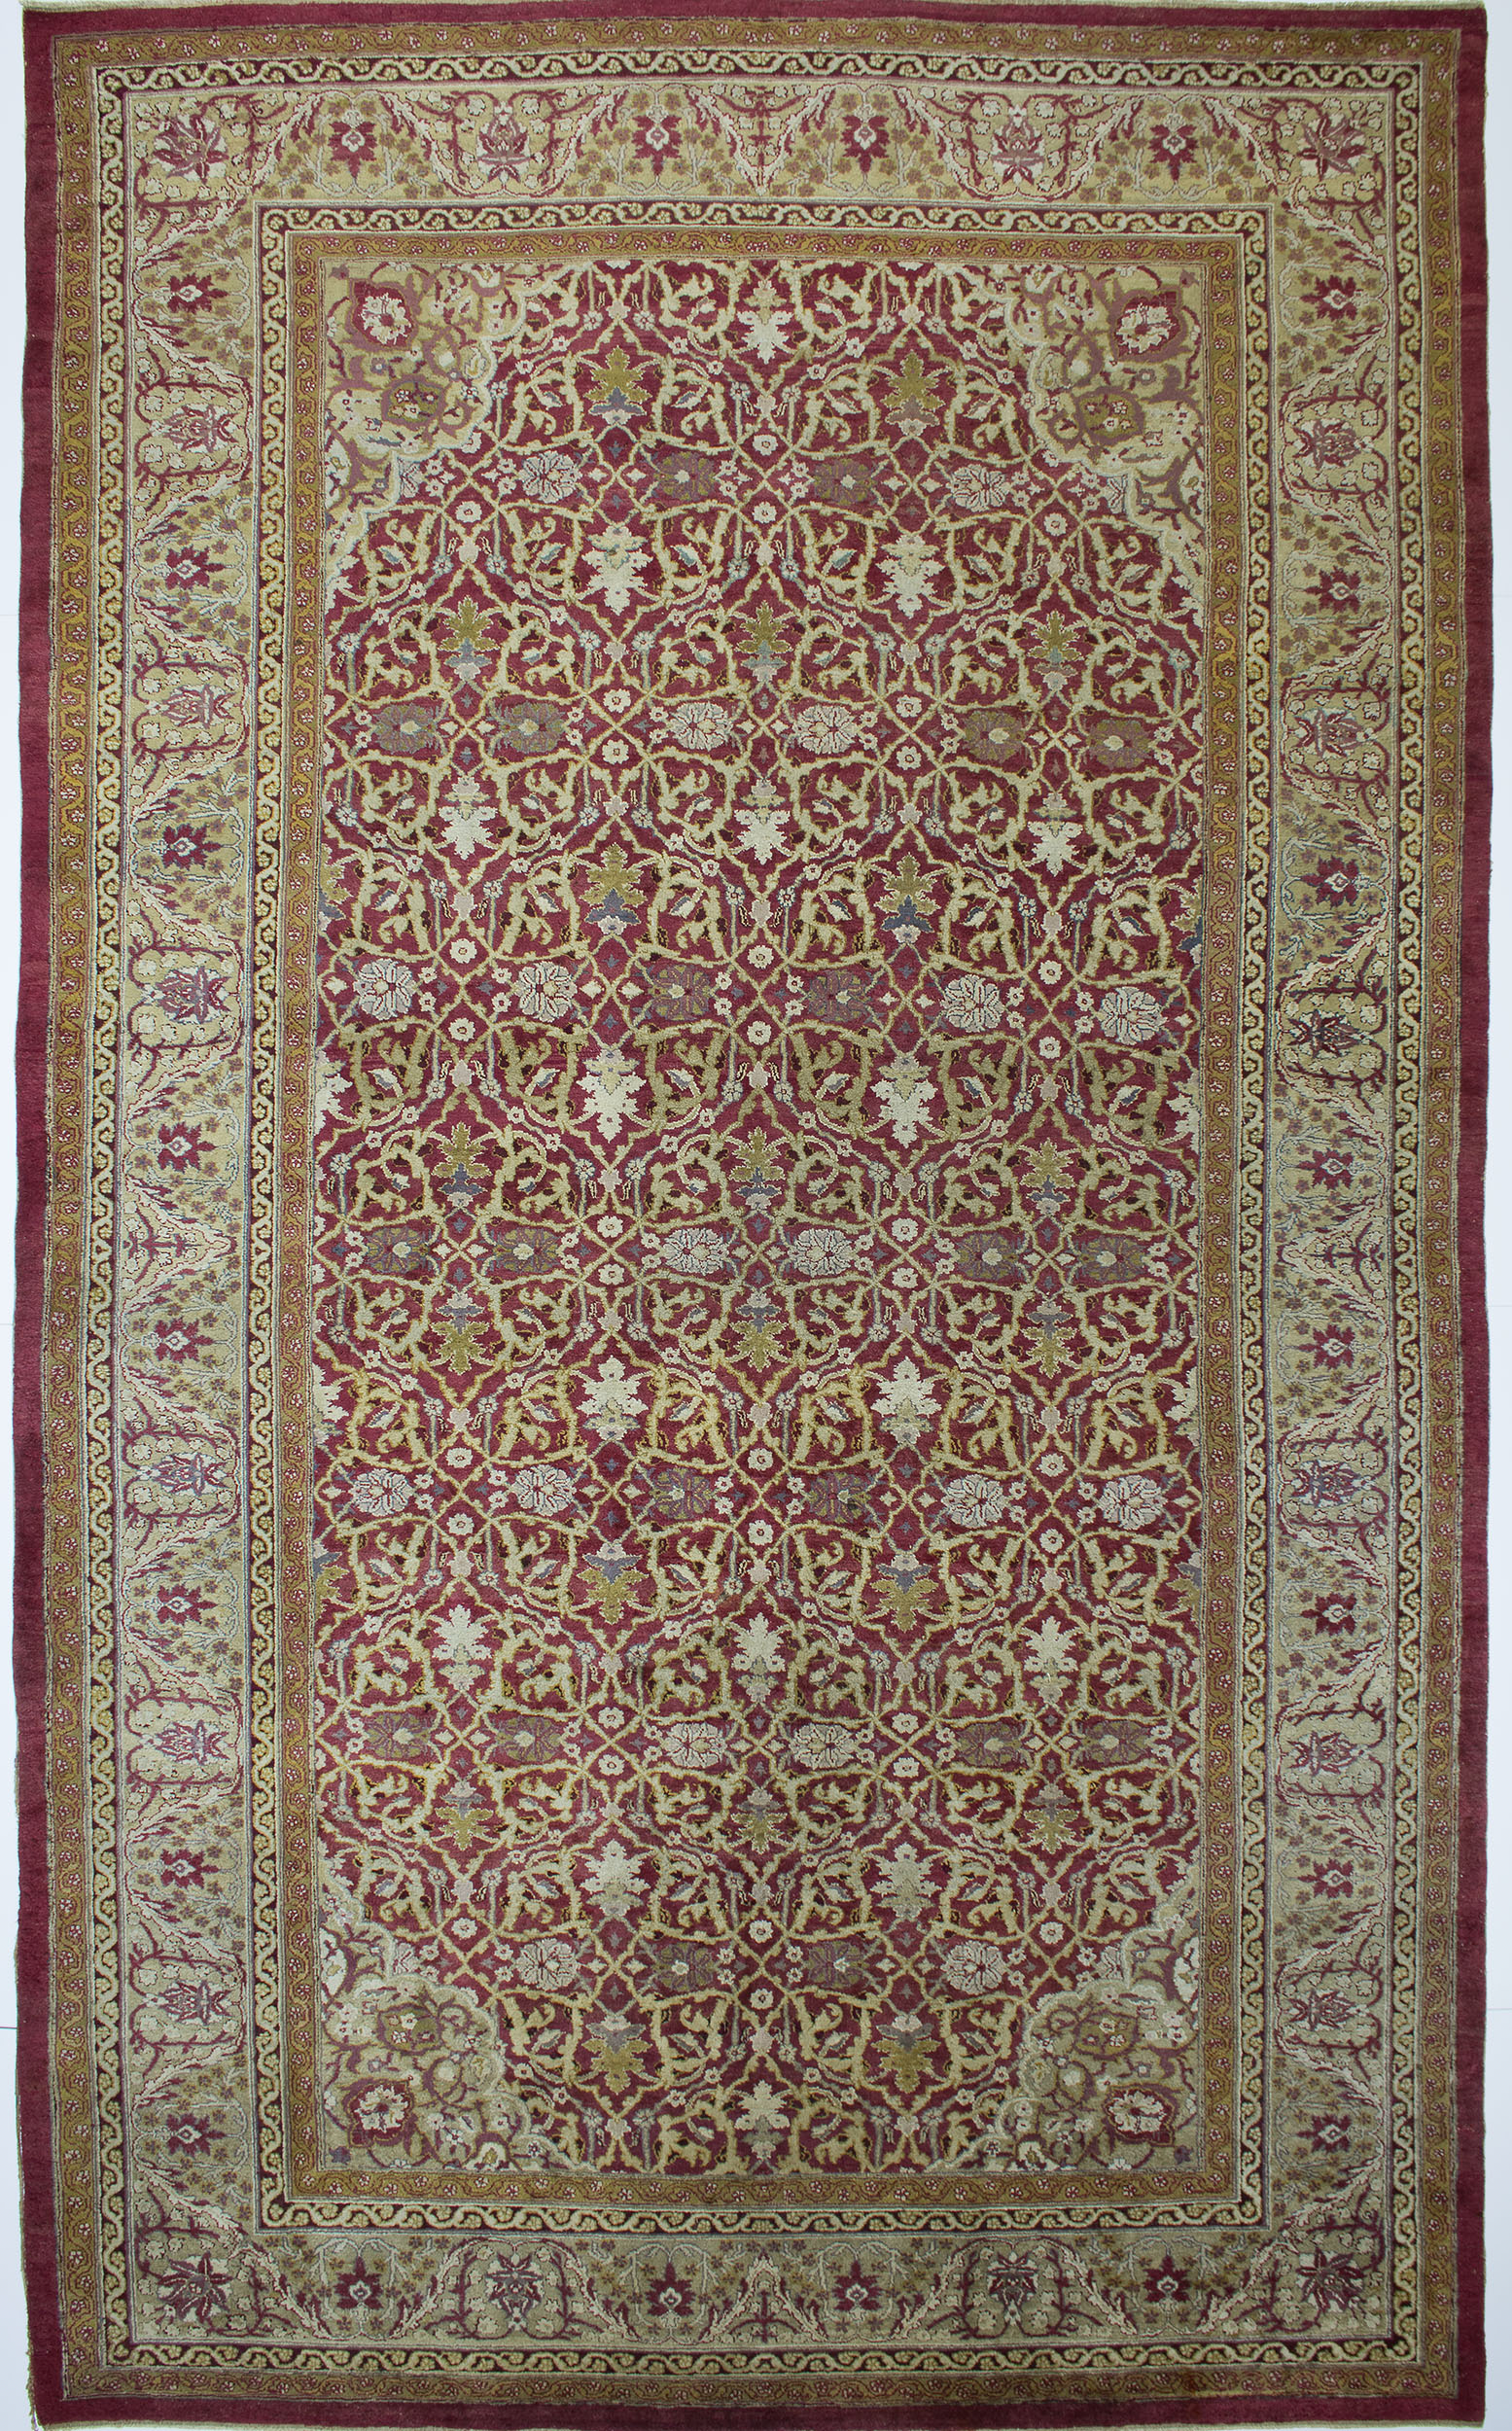 "Copy of Agra Carpet 17' 4"" x 10' 2"""